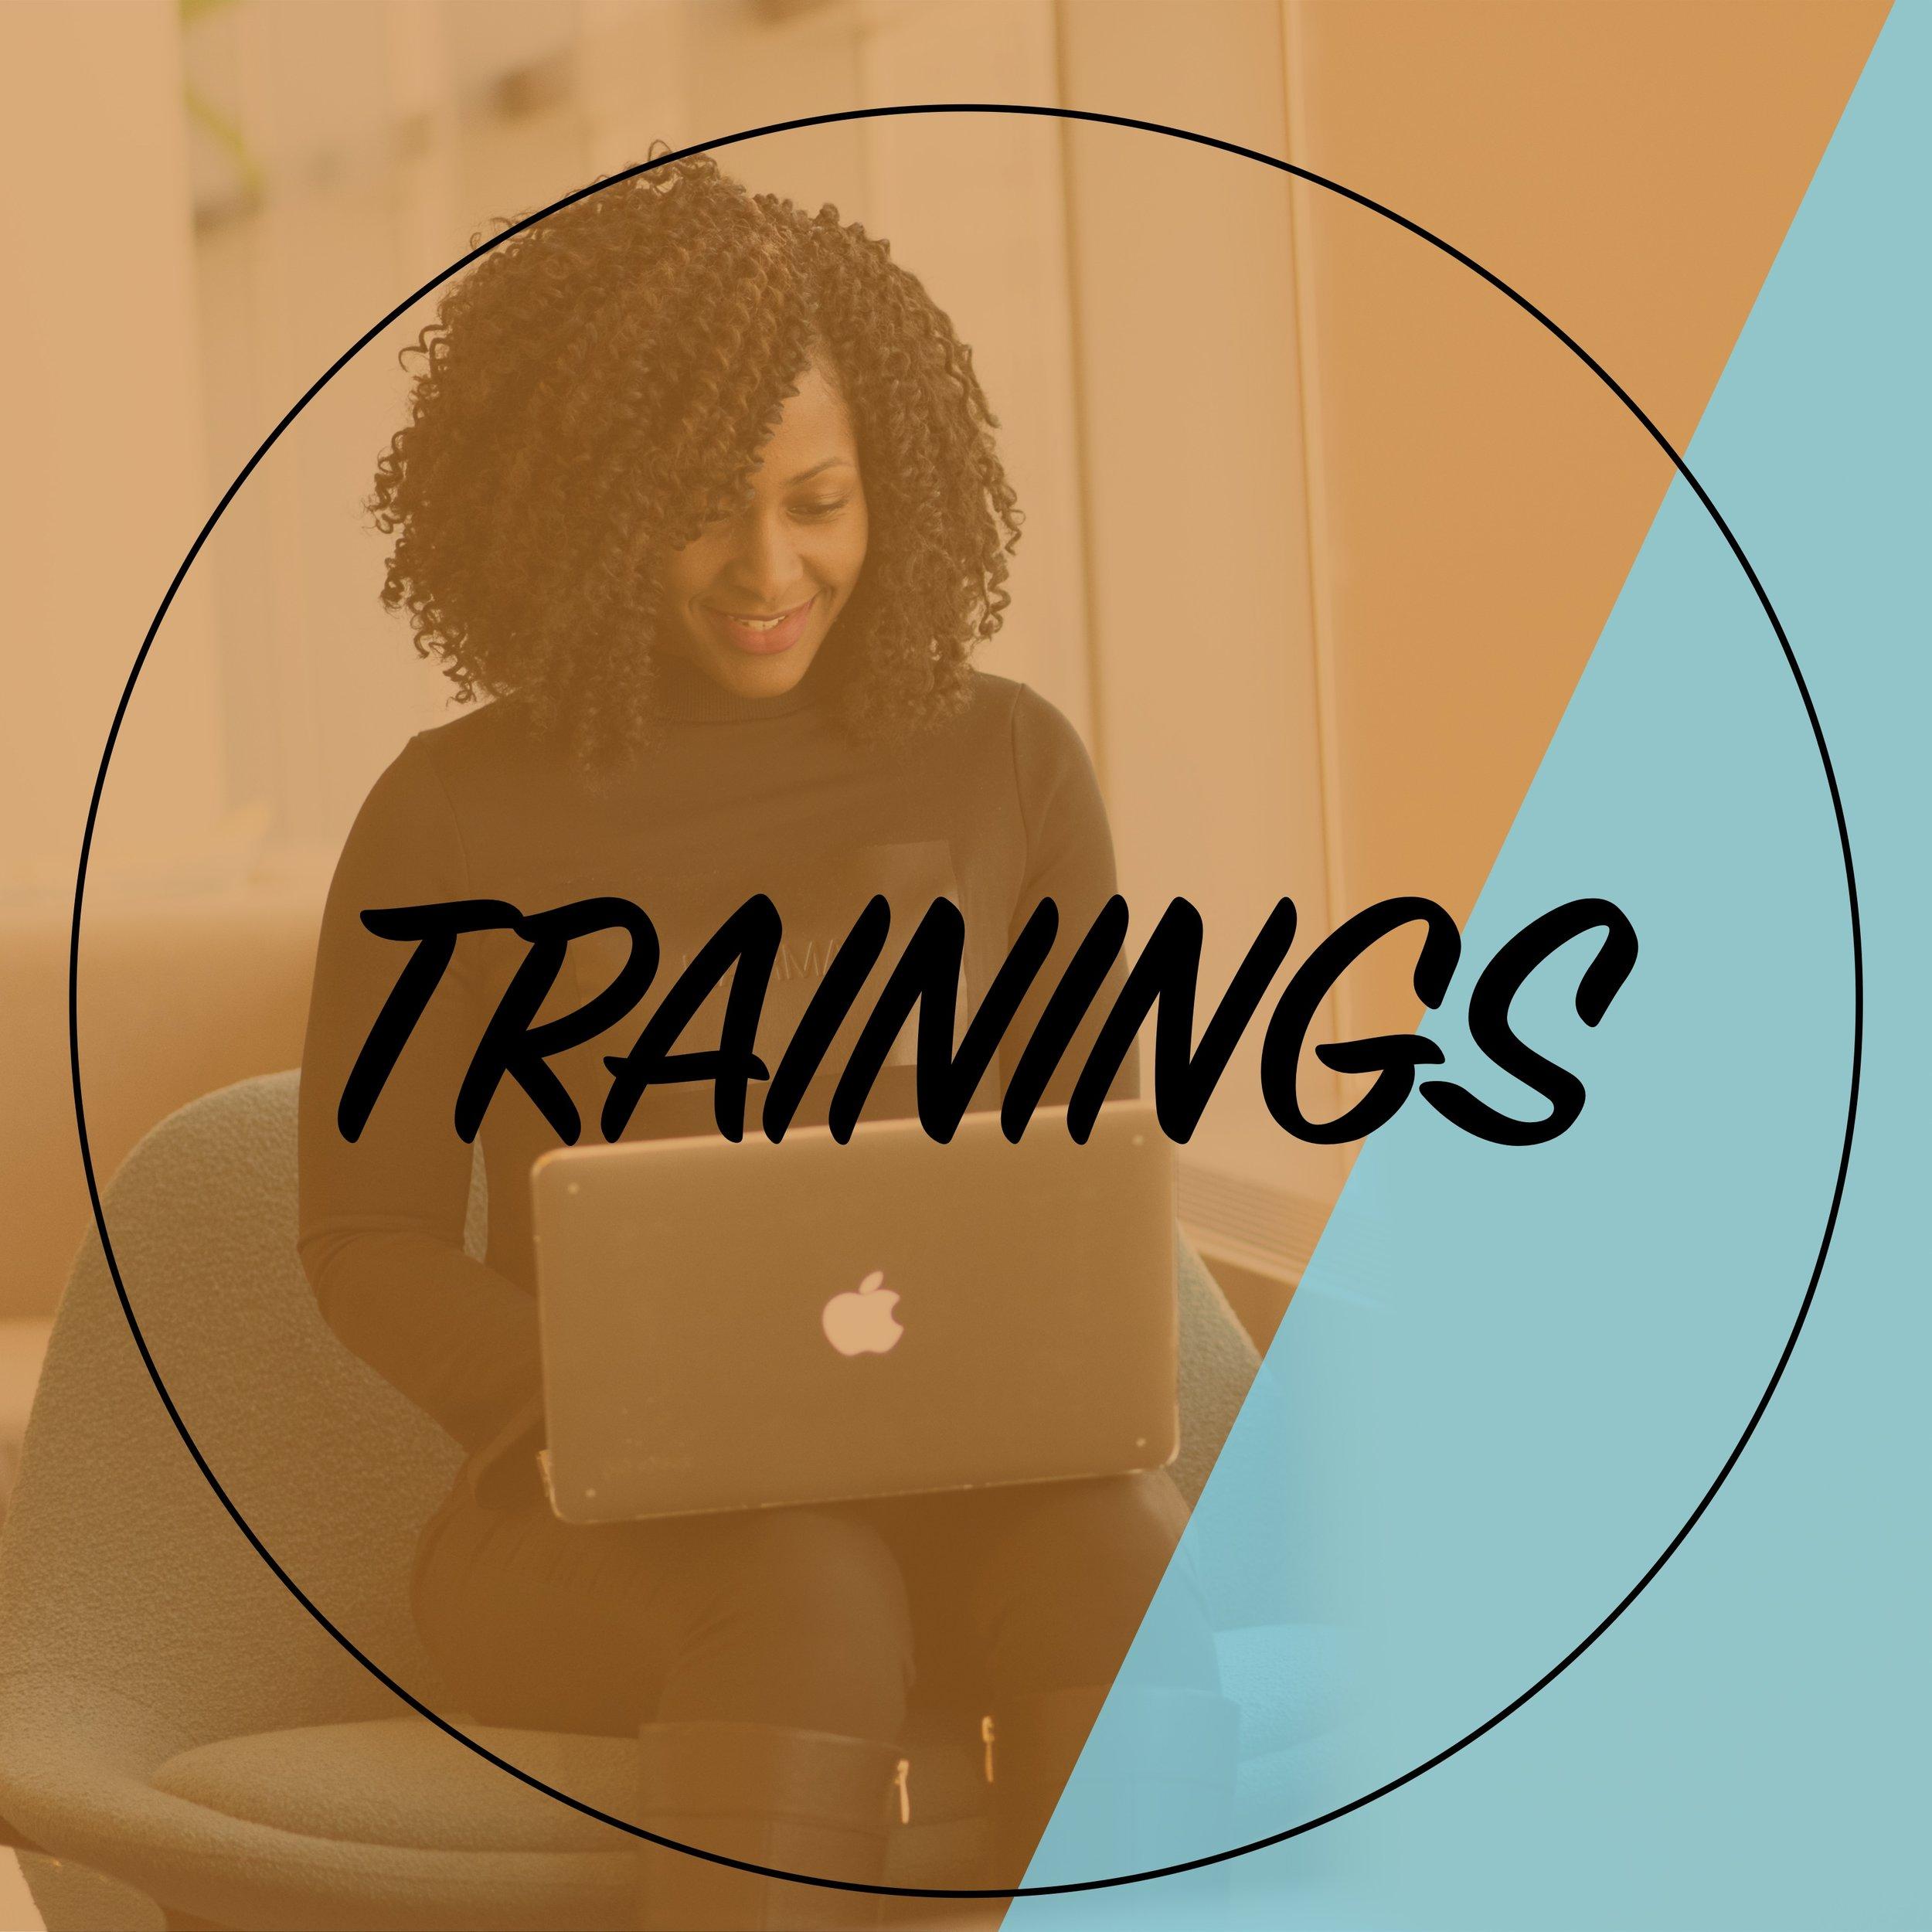 The Scholar Circle Grpahics-Trainings.jpg